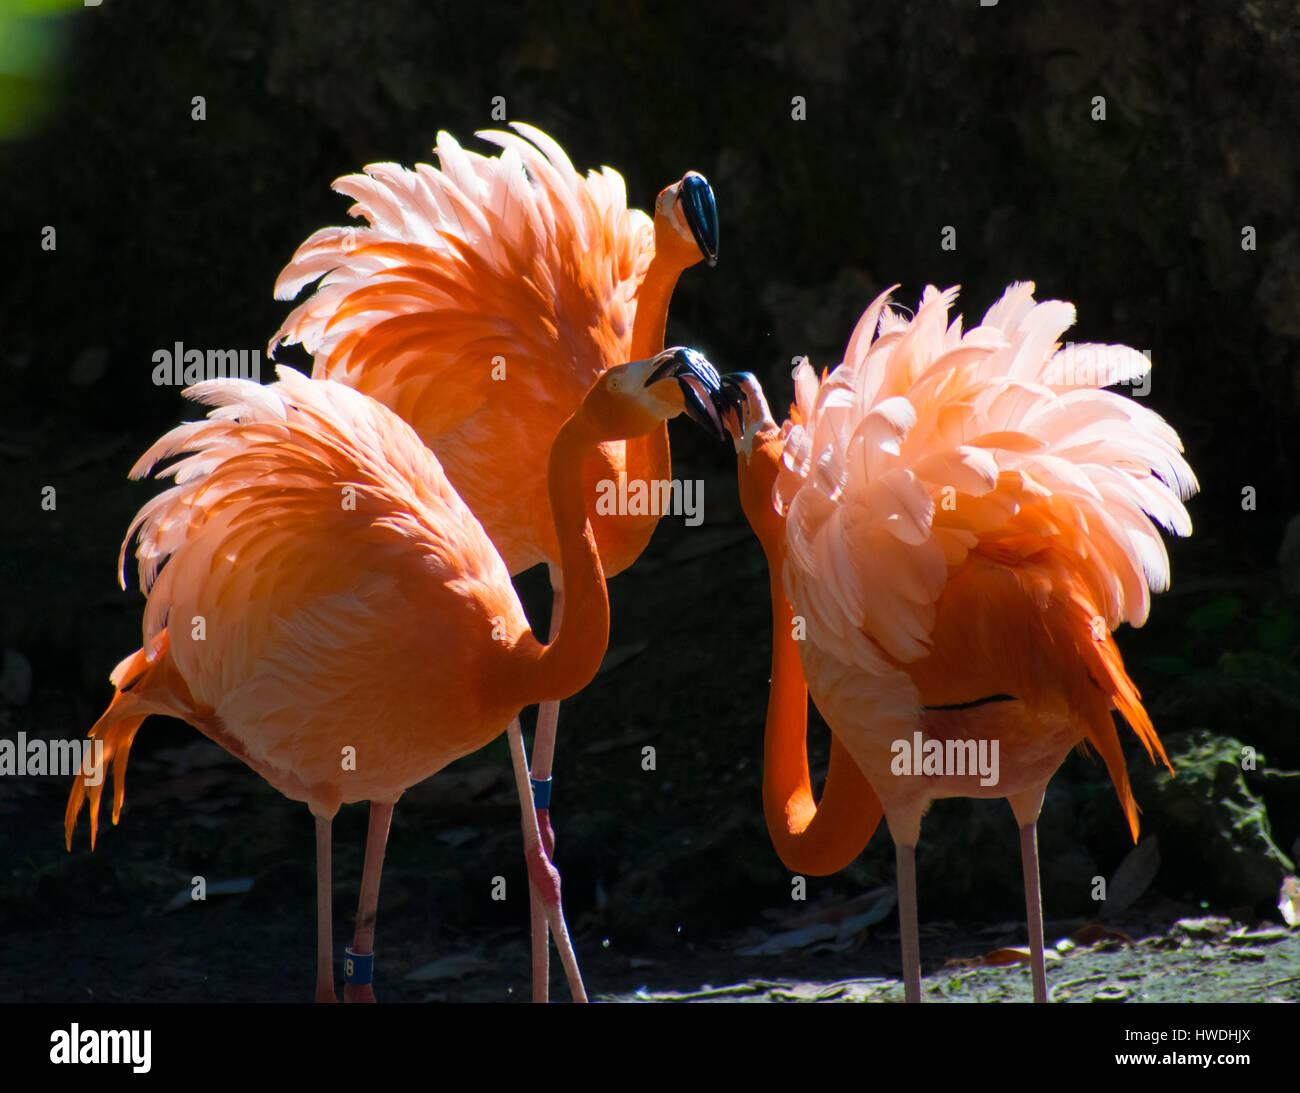 Three flamingos fighting over territory - Stock Image